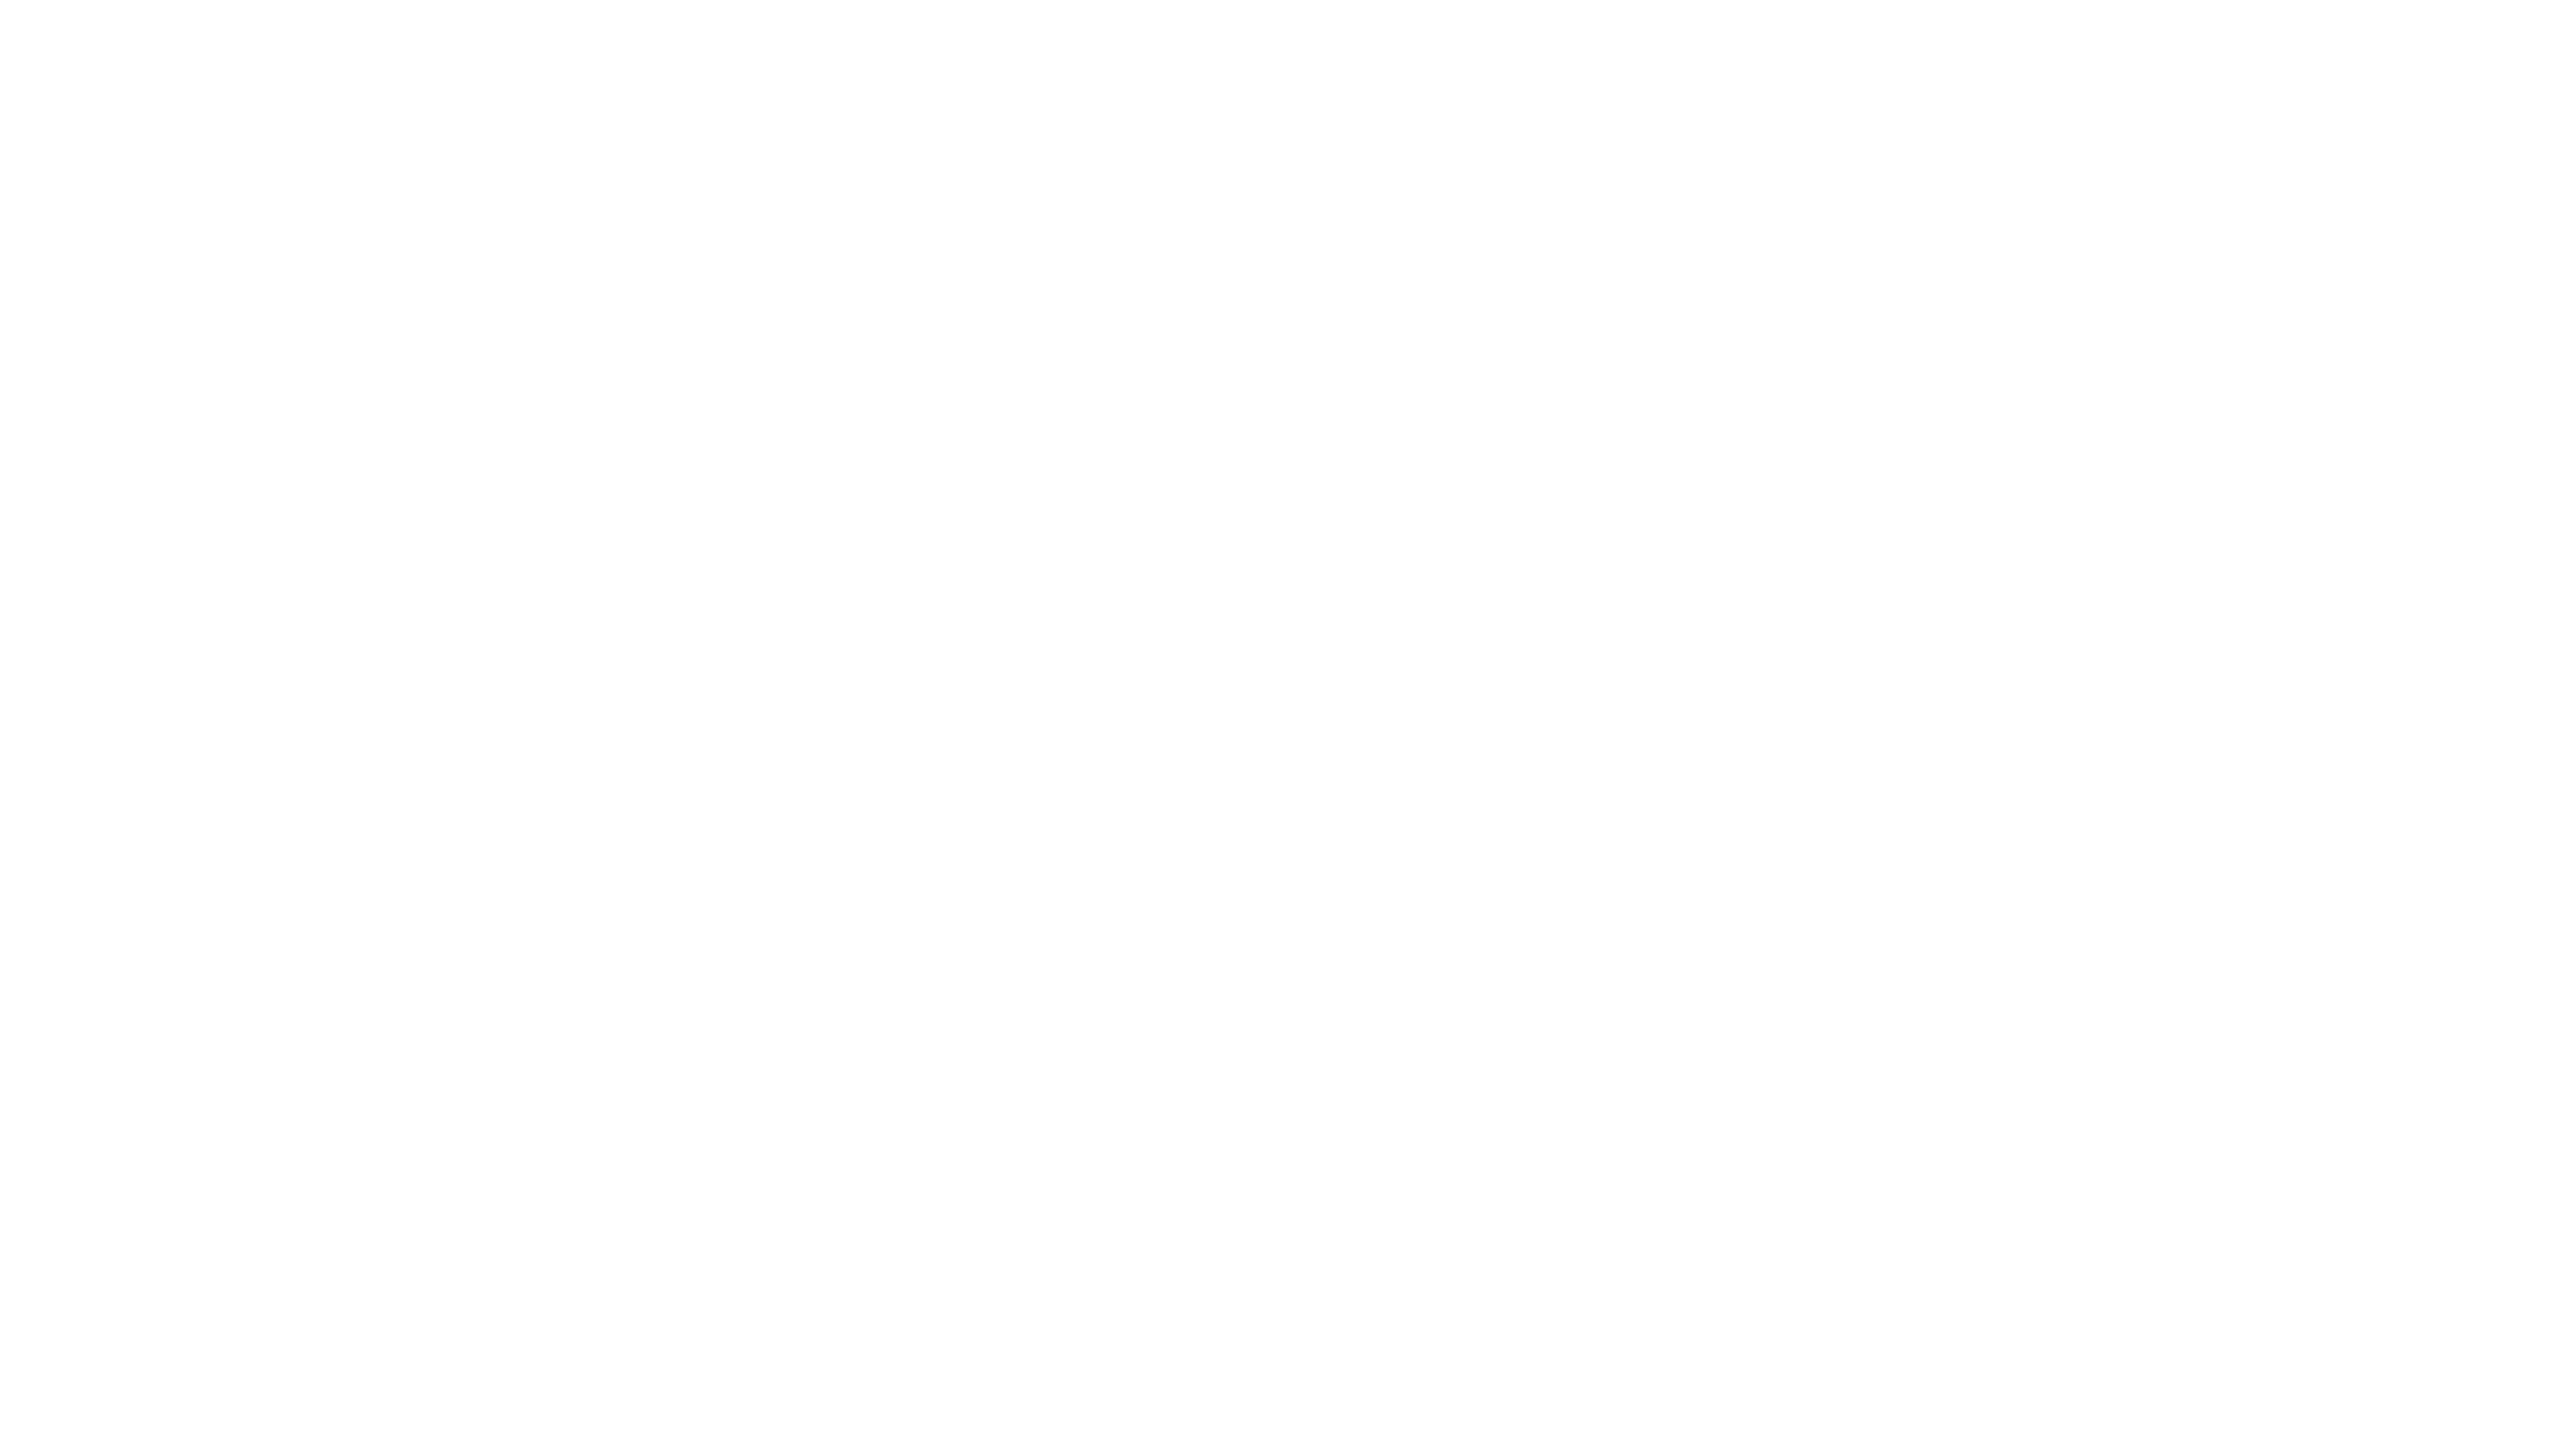 siteimprove_logo_2020_stacked_white